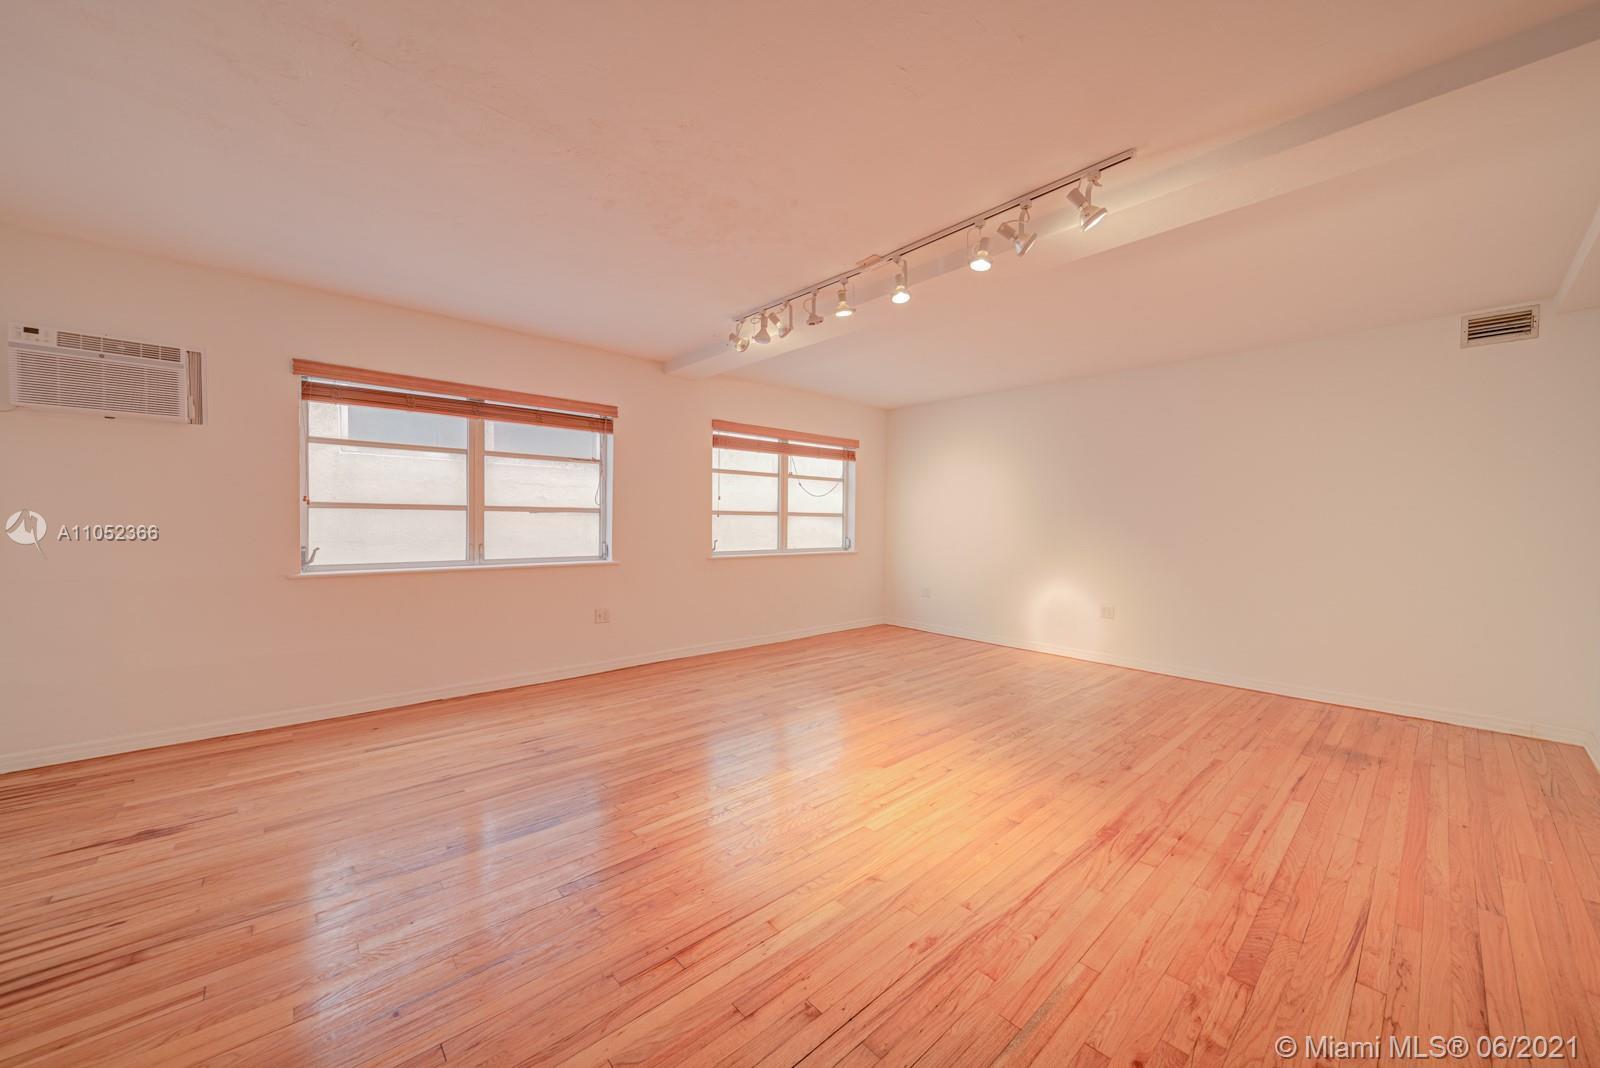 1200  Washington Ave  For Sale A11052366, FL